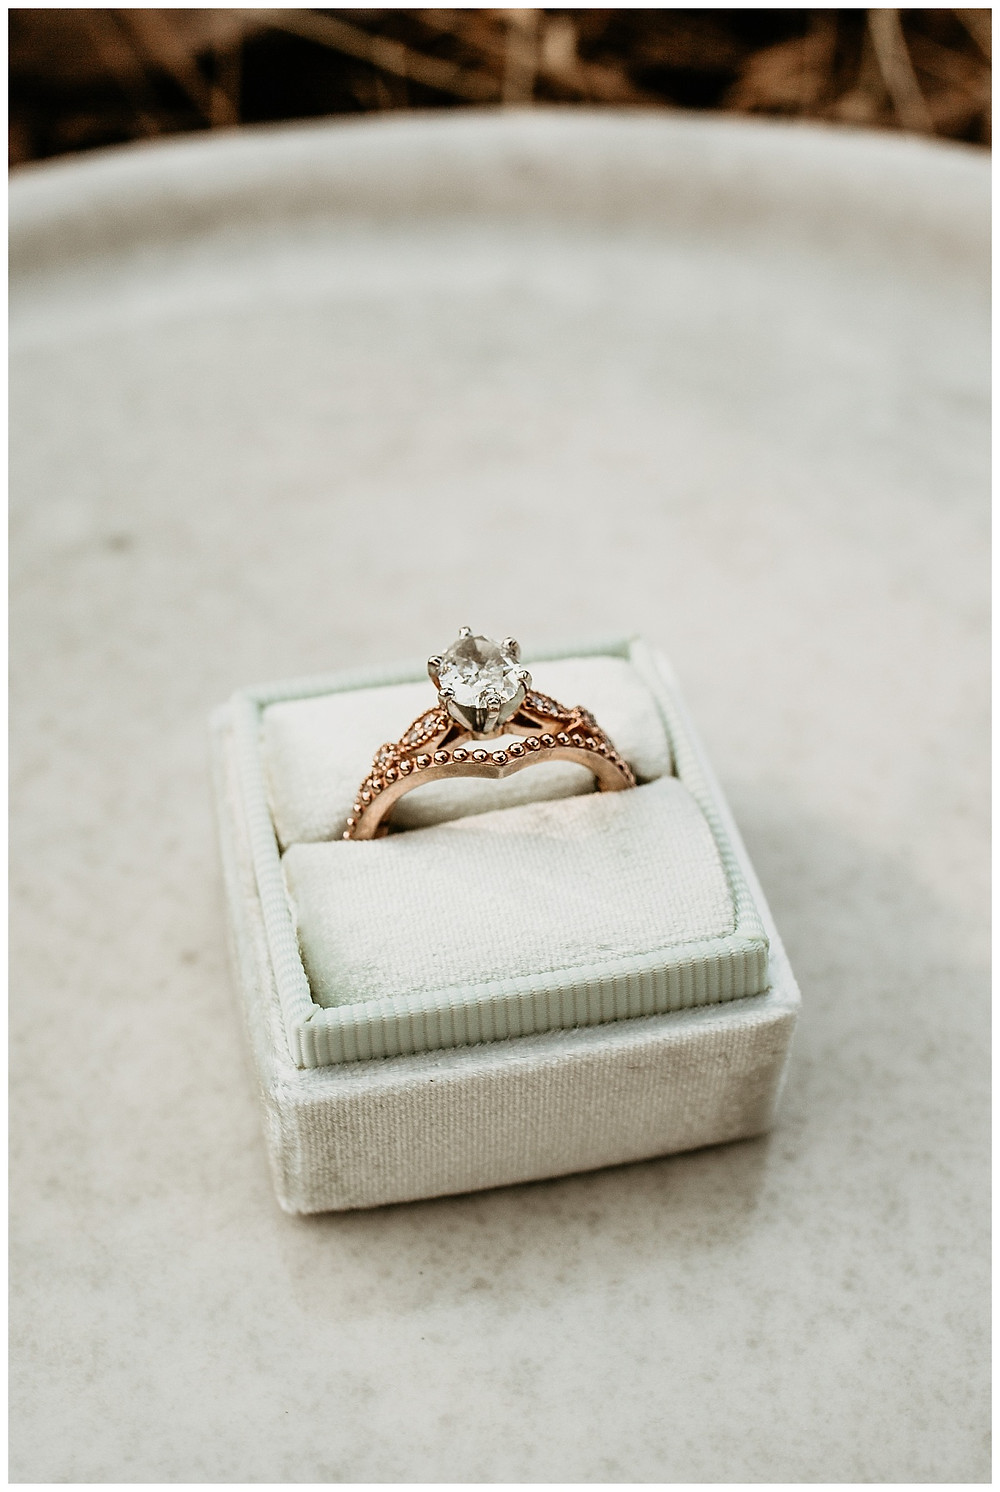 Mint Colored Velvet Ring Box with Rose Gold Diamond Ring